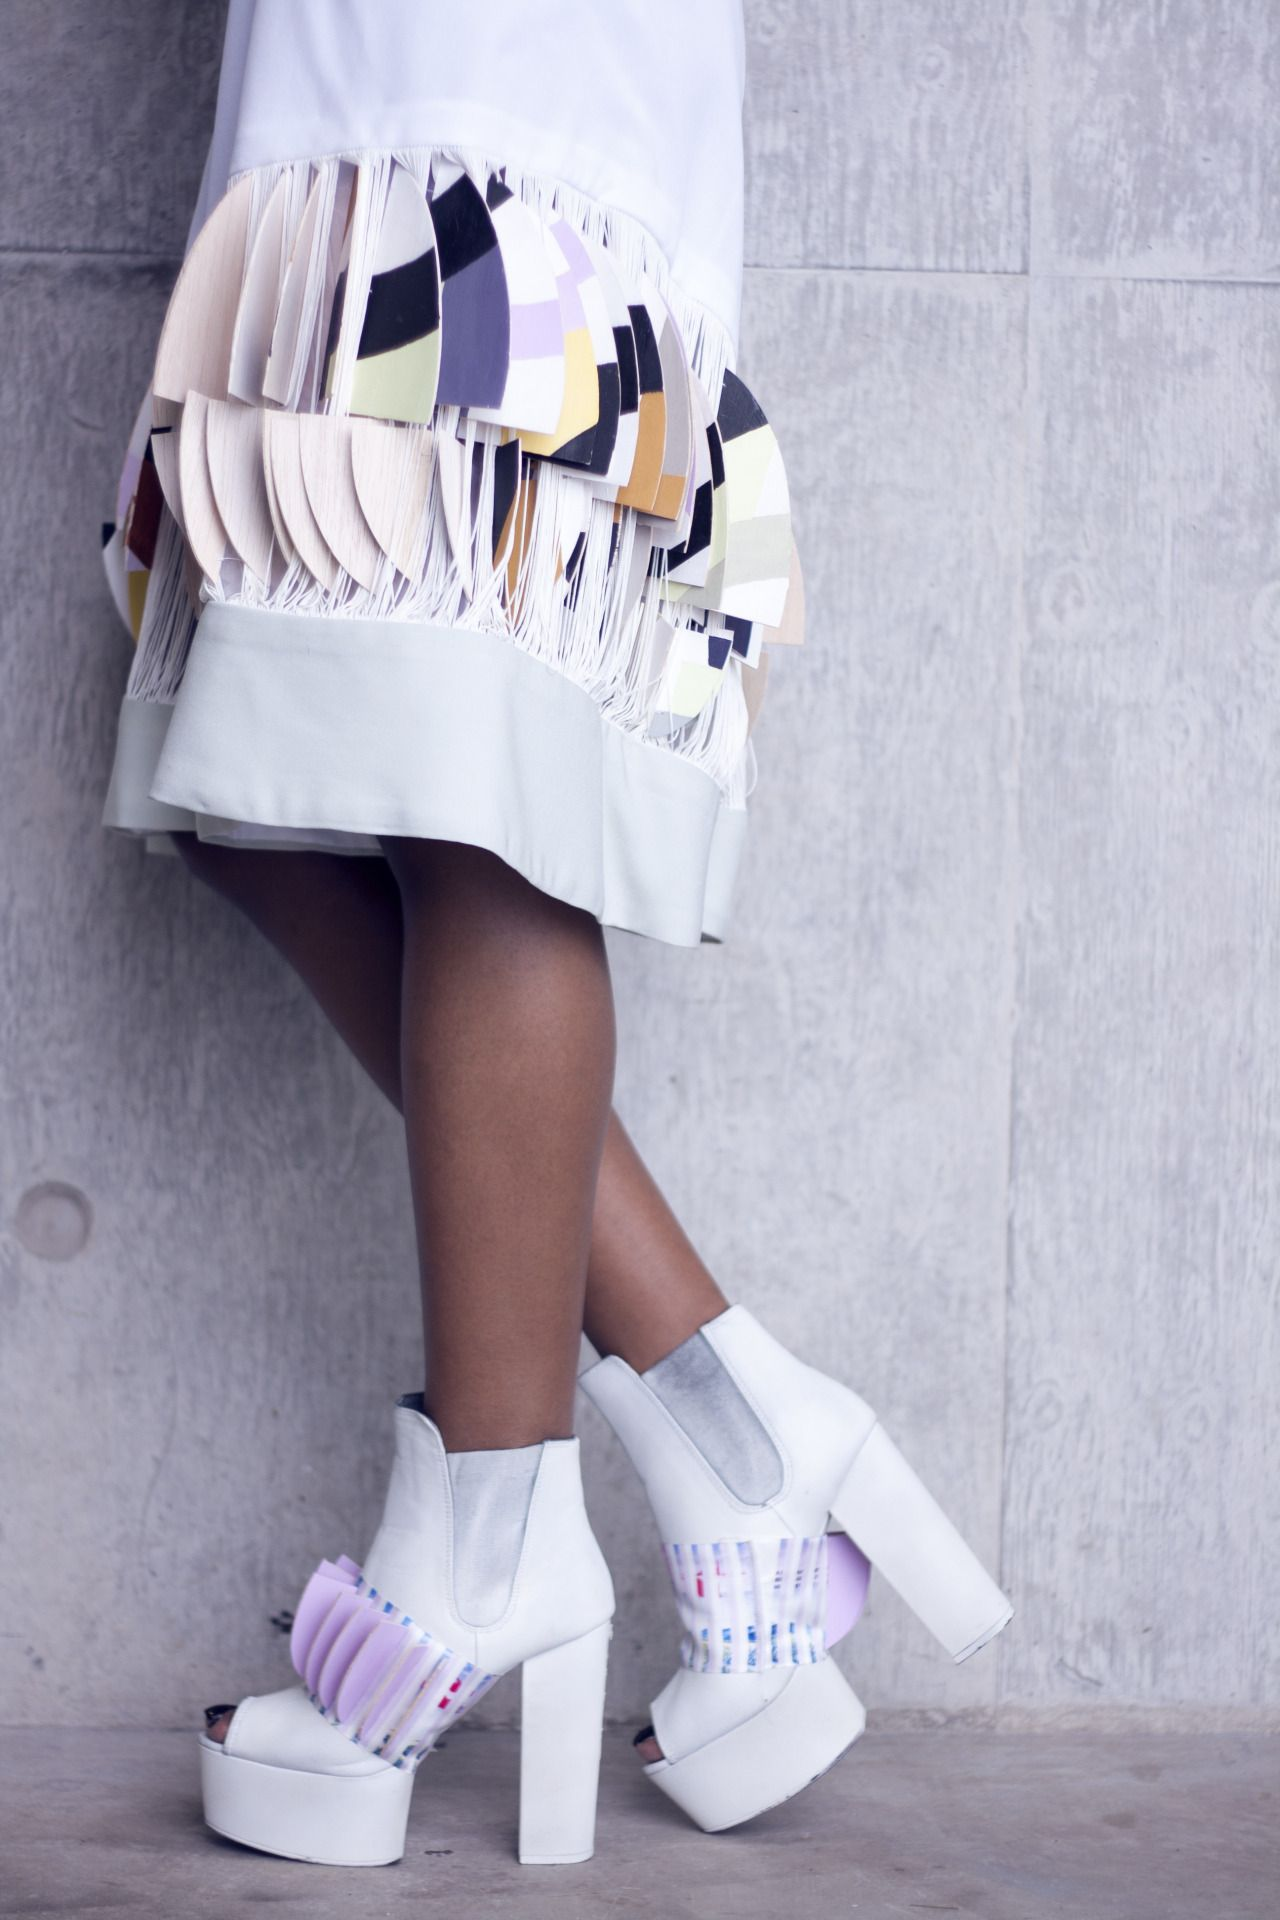 Colombine Jubert, Couture Collection- Central Saint Martins http://colombinejubertdesign.tumblr.com/